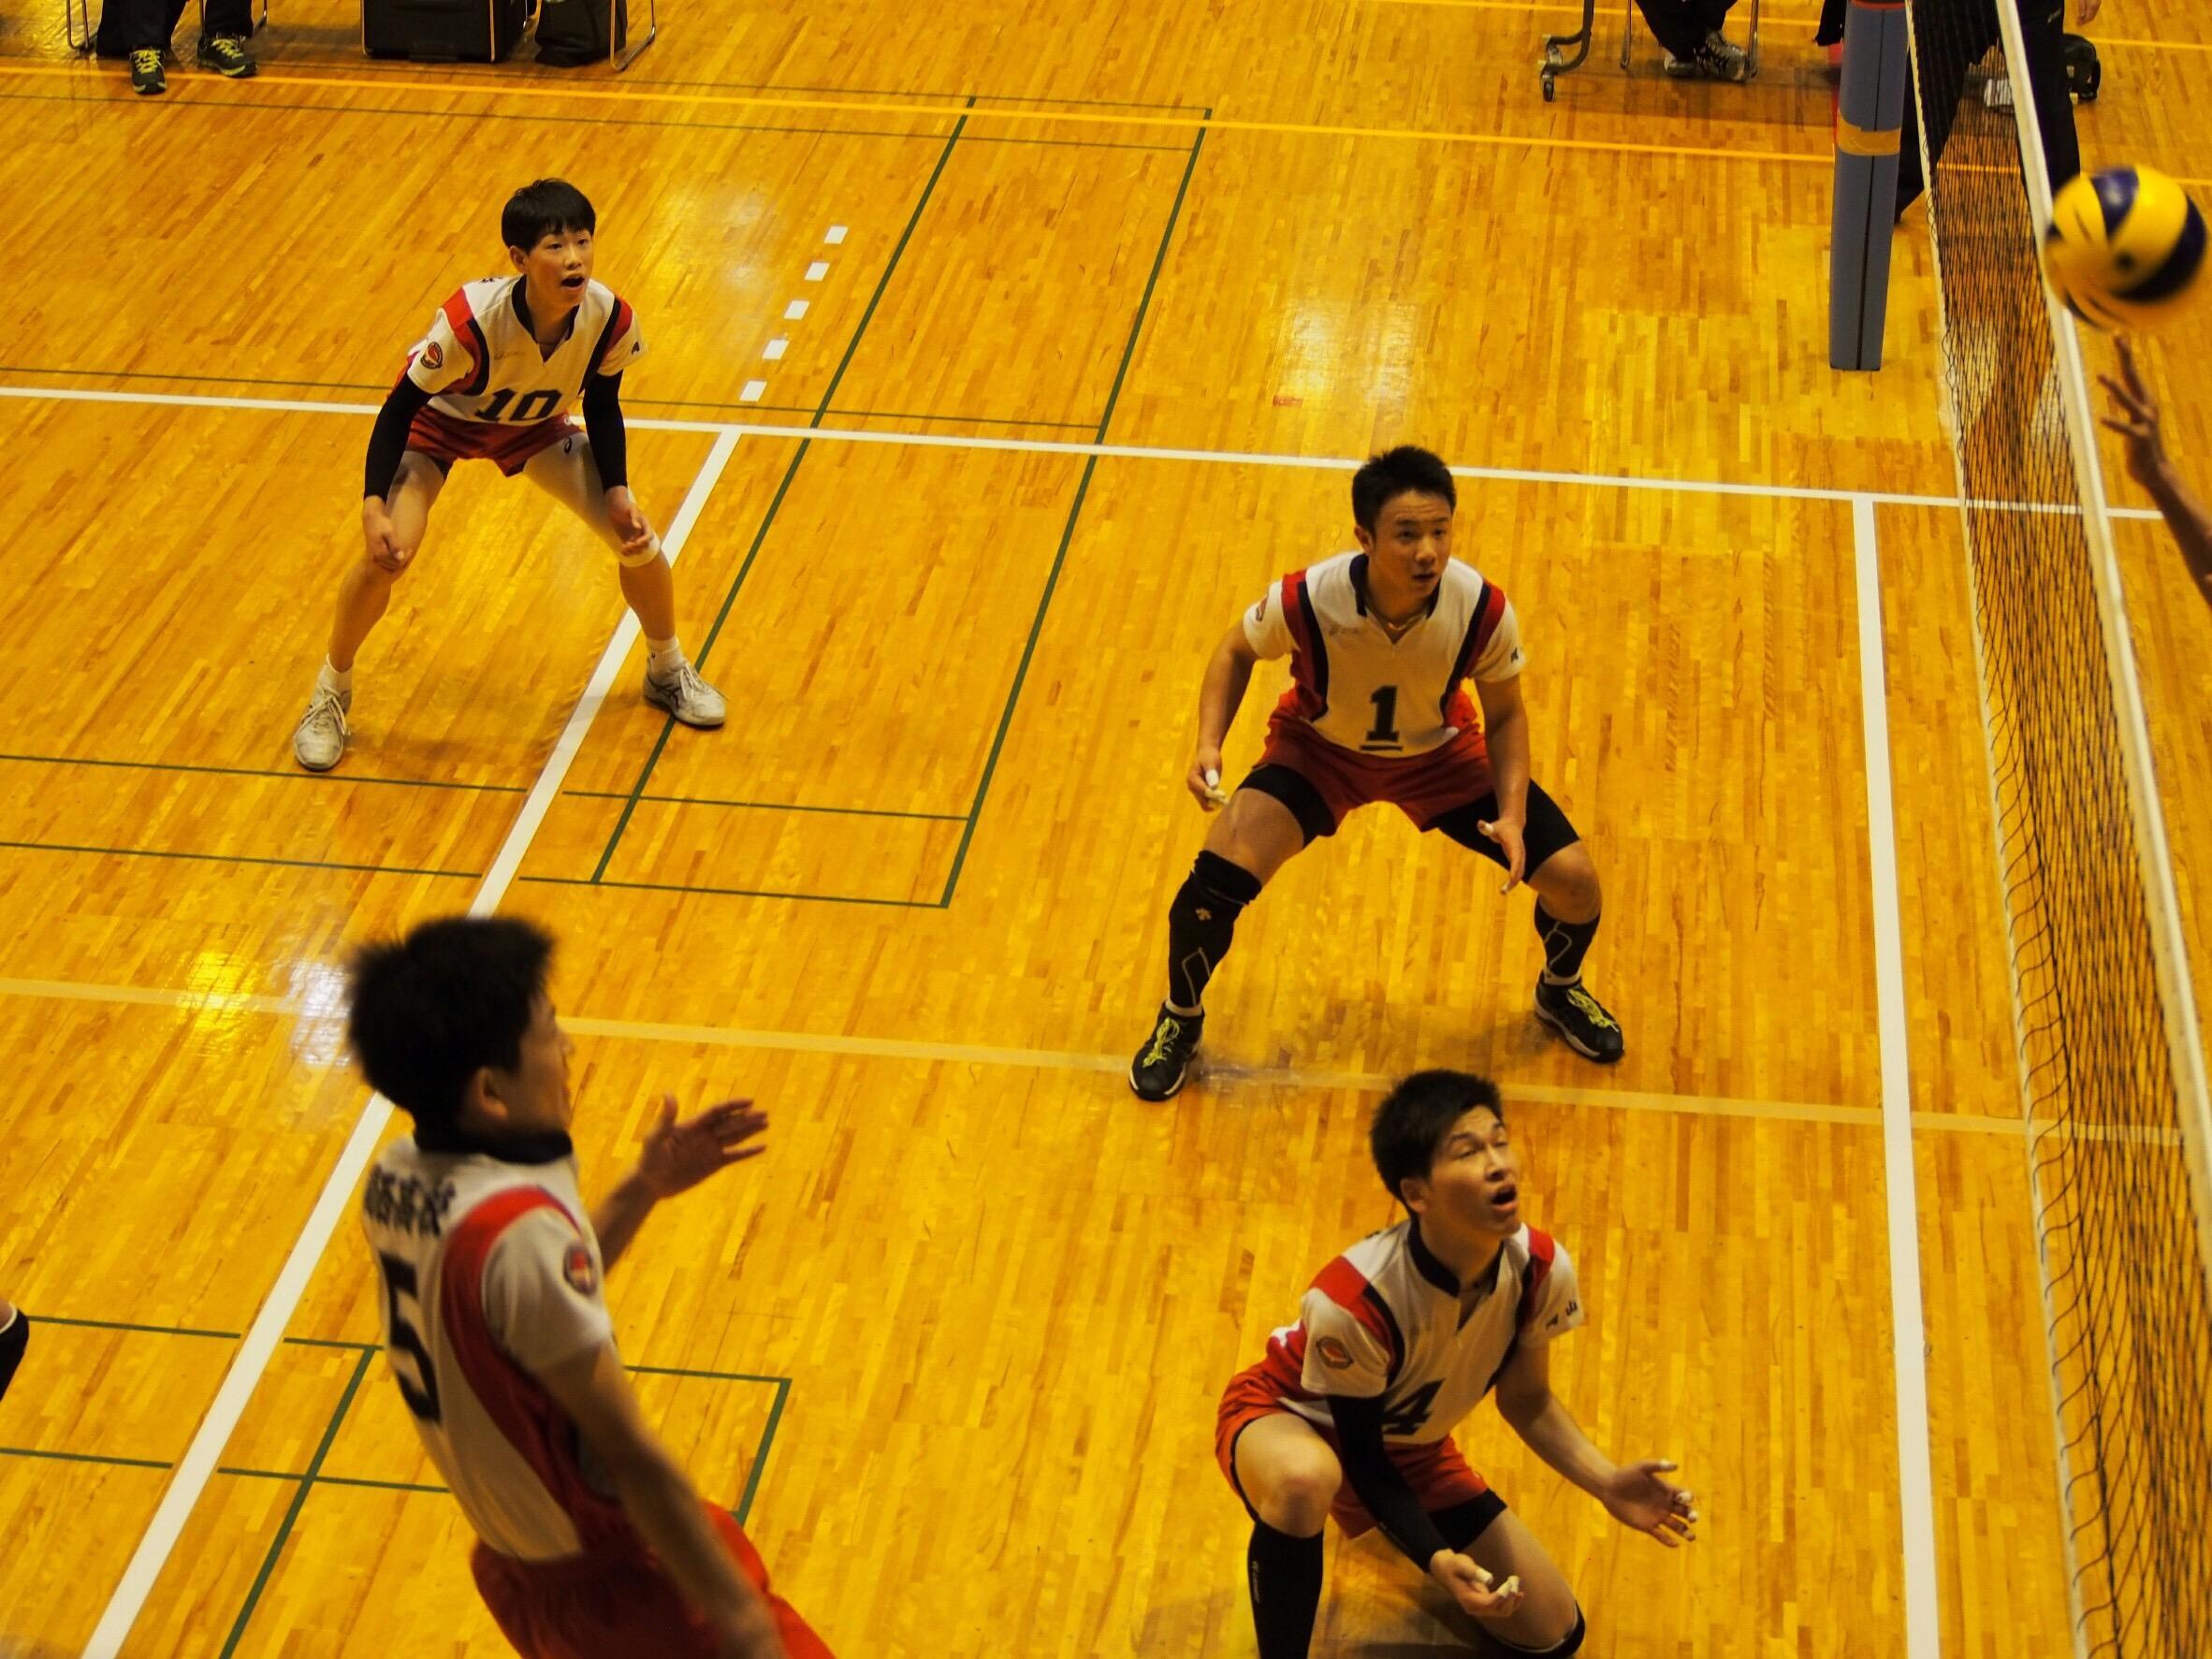 第27回中国高等学校新人バレーボール大会